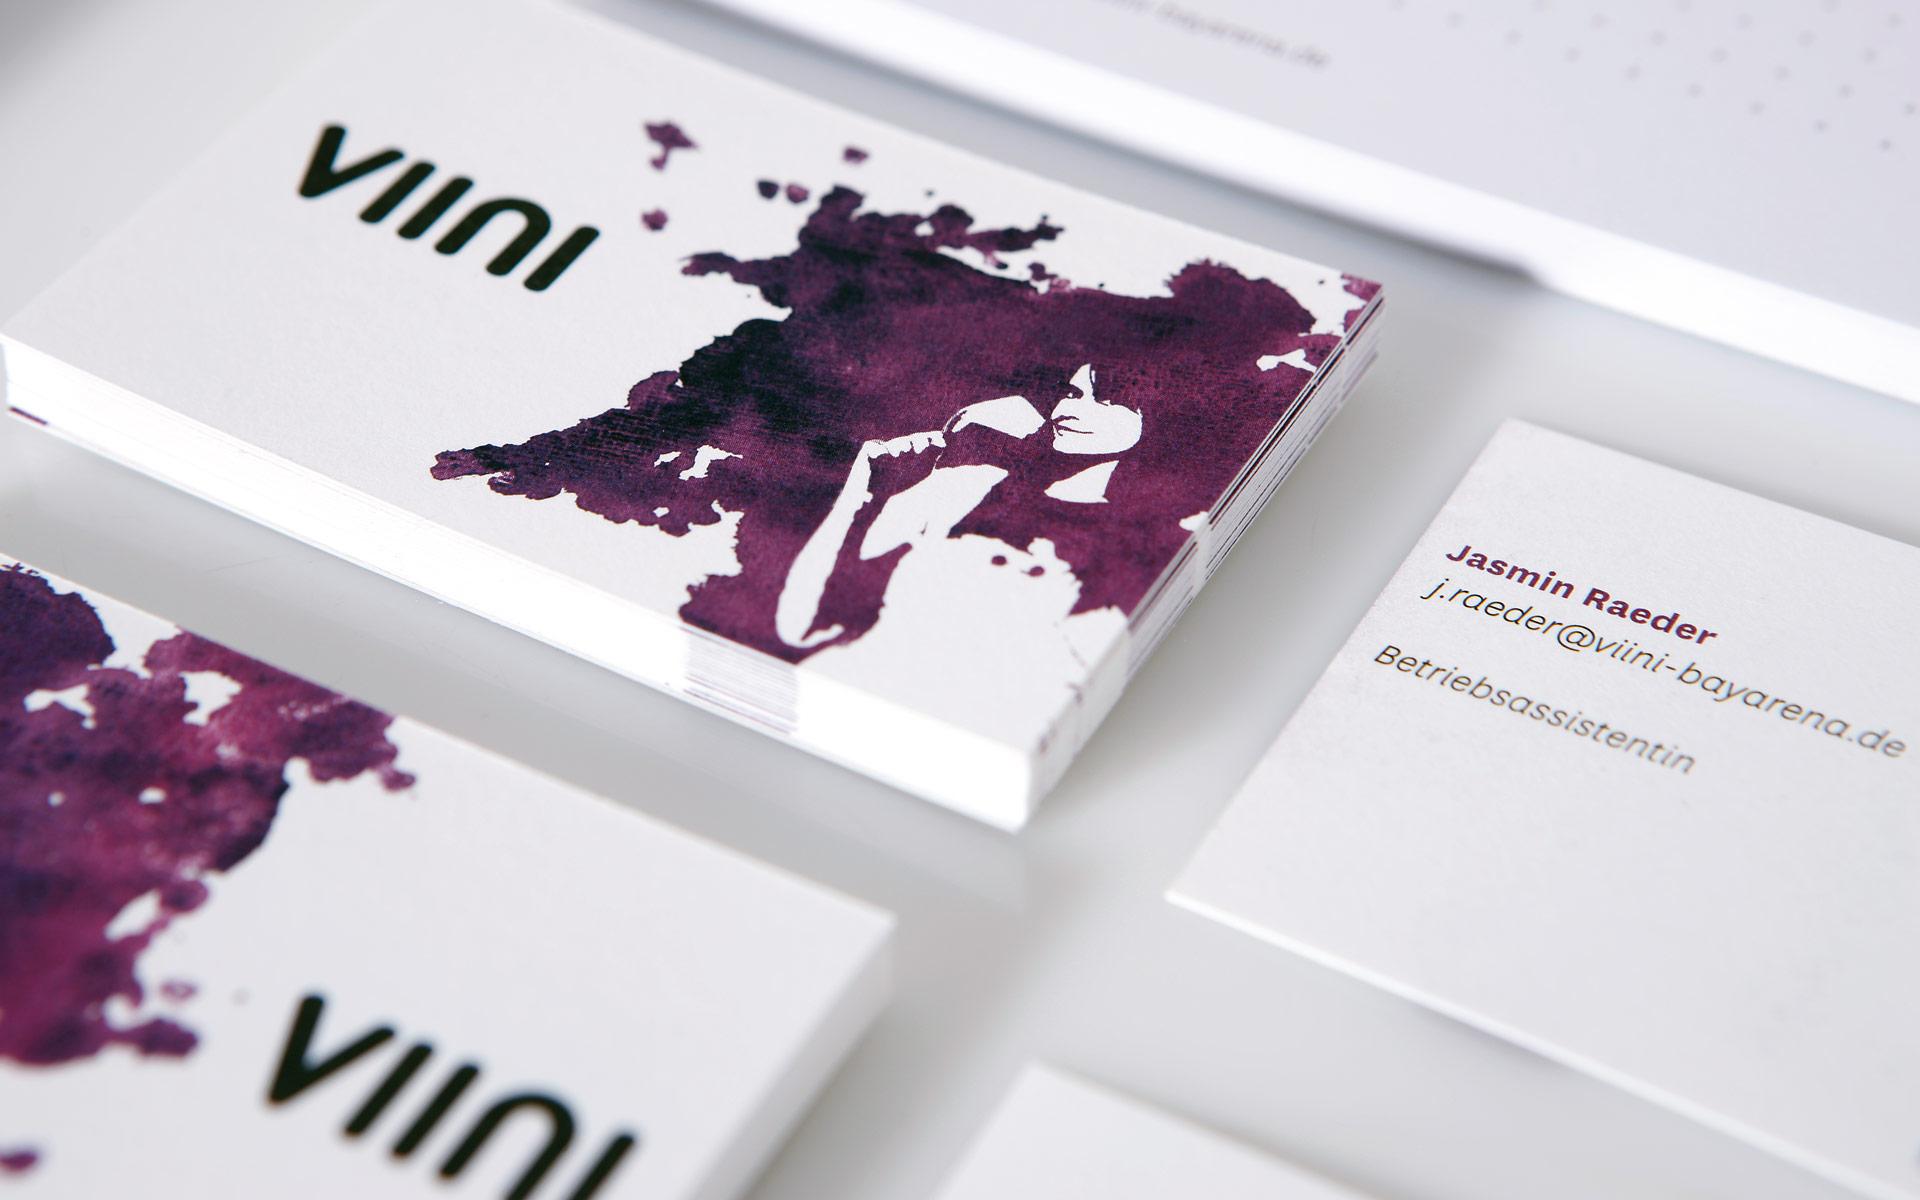 VIINI Brand Identity, Corporate Design, Geschäftsausstattung, Visitenkarte